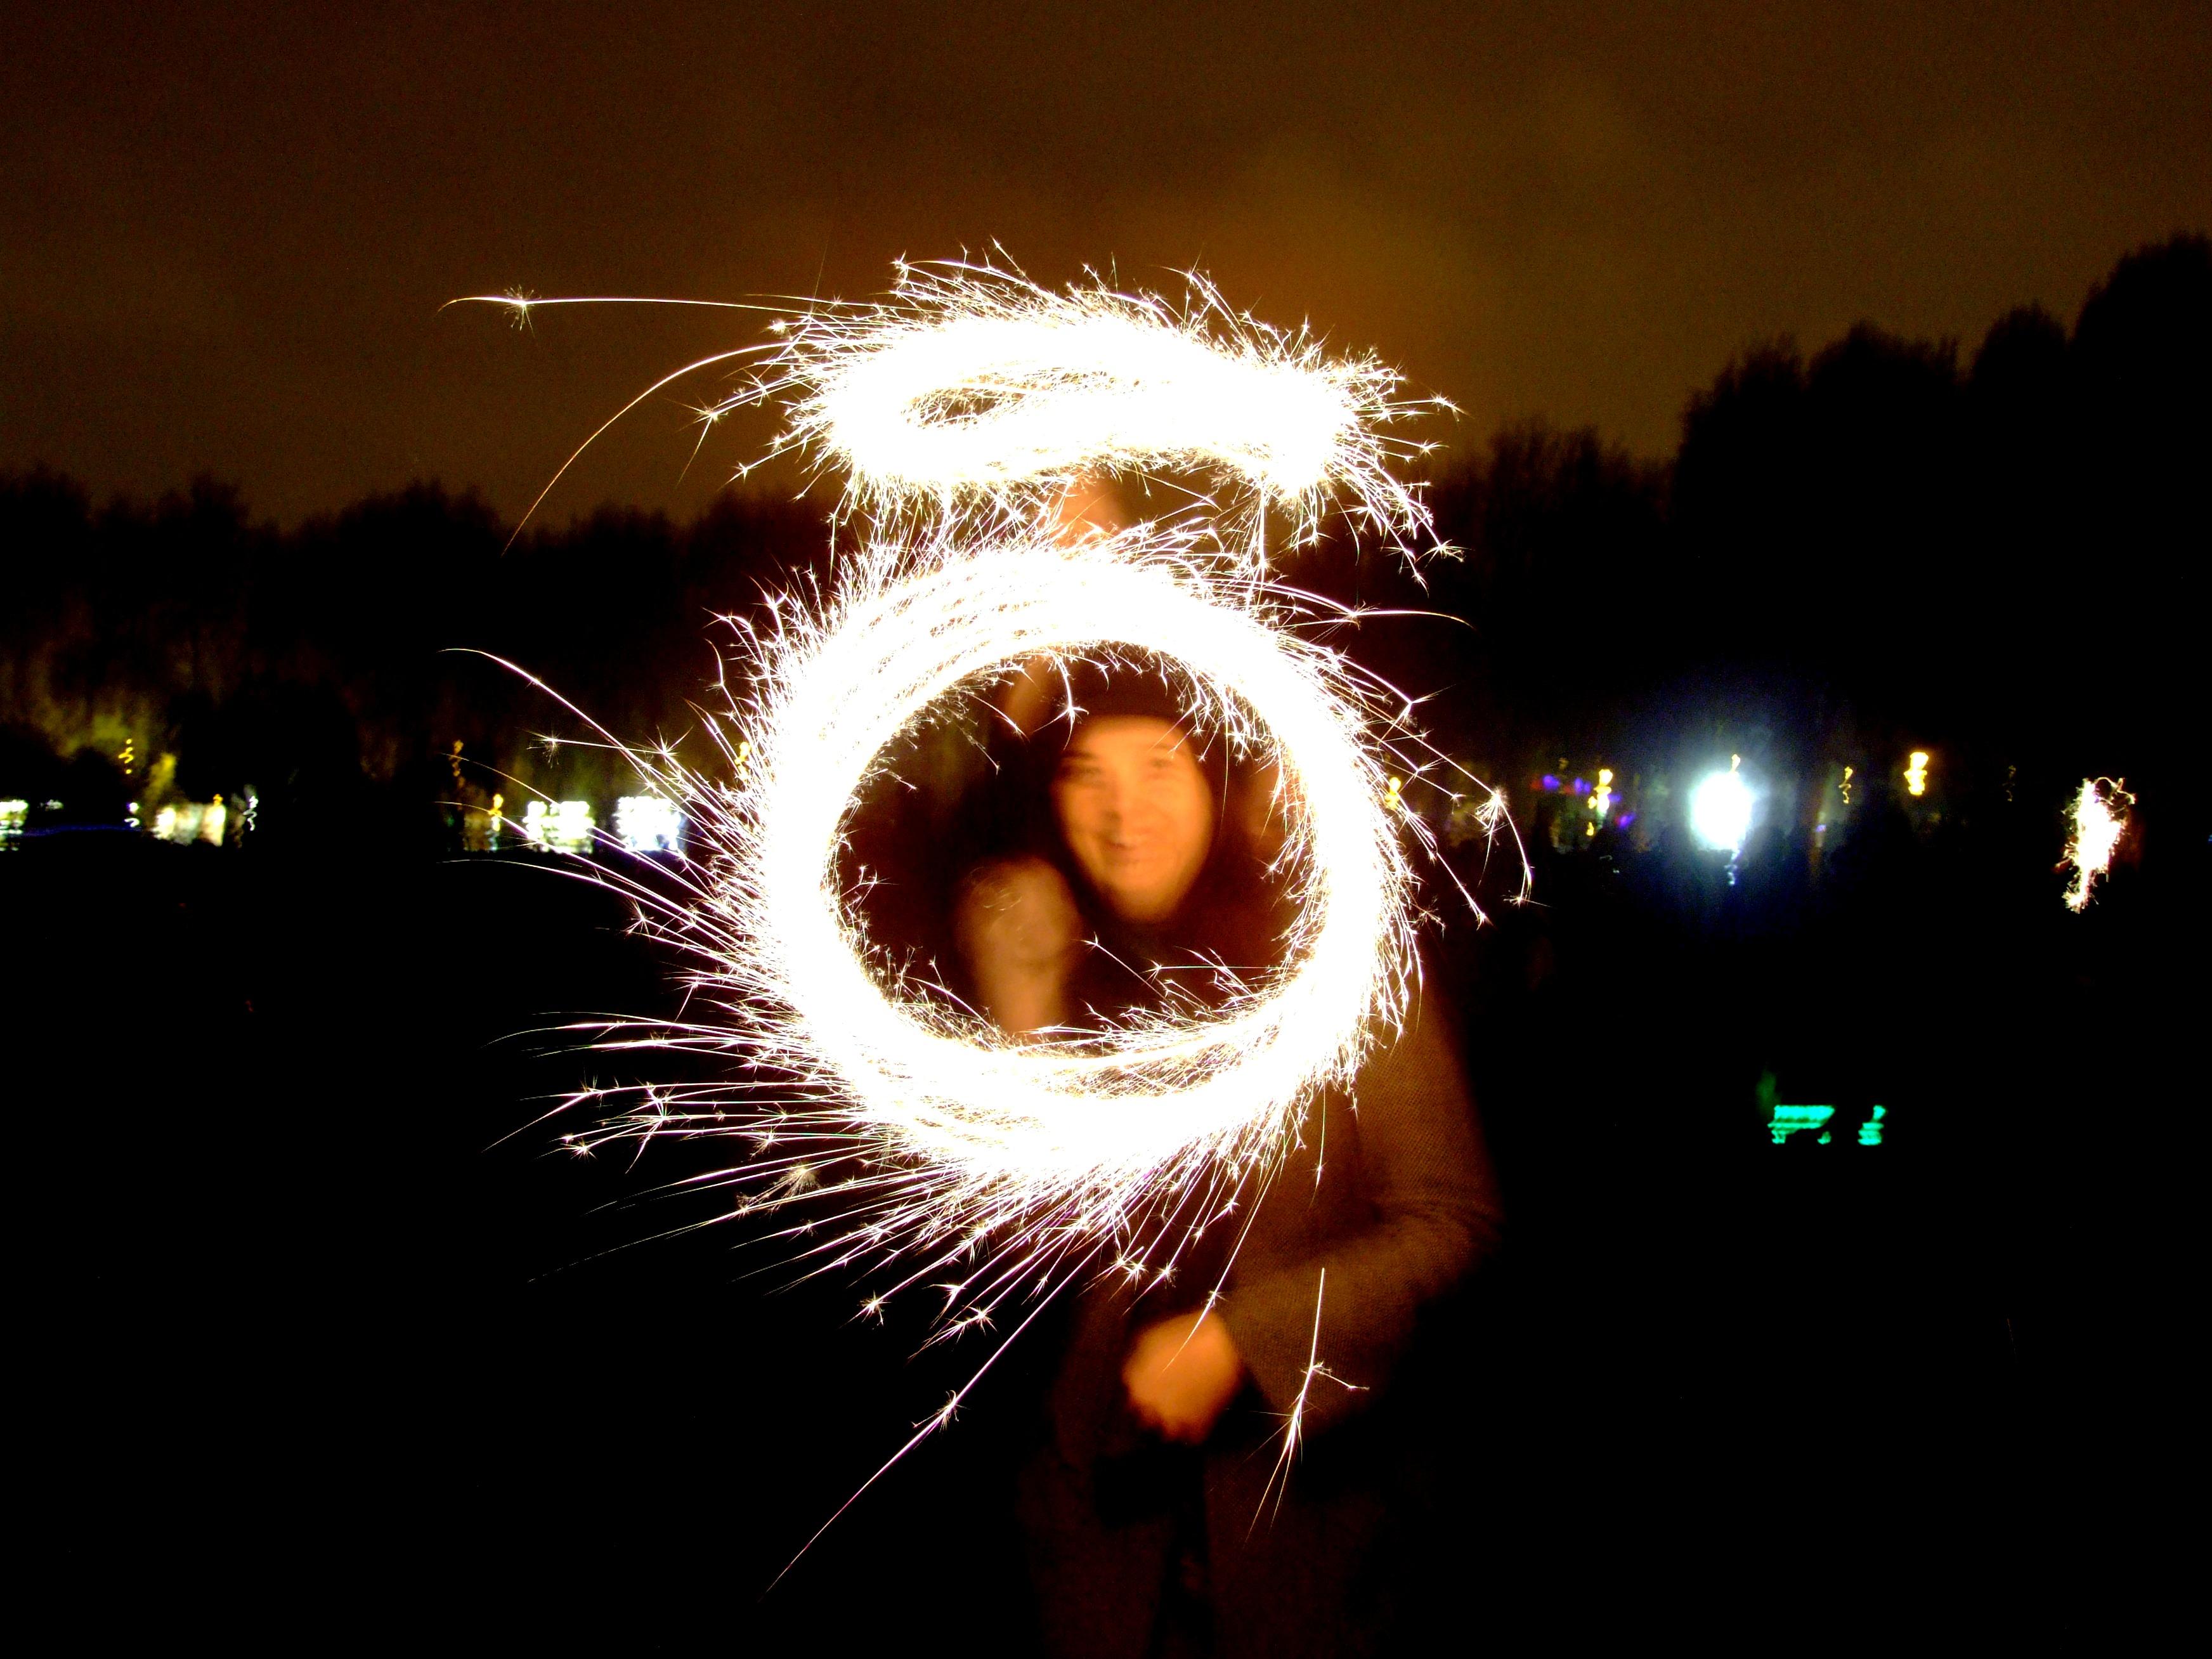 Guy fawkes local enjoying fireworks